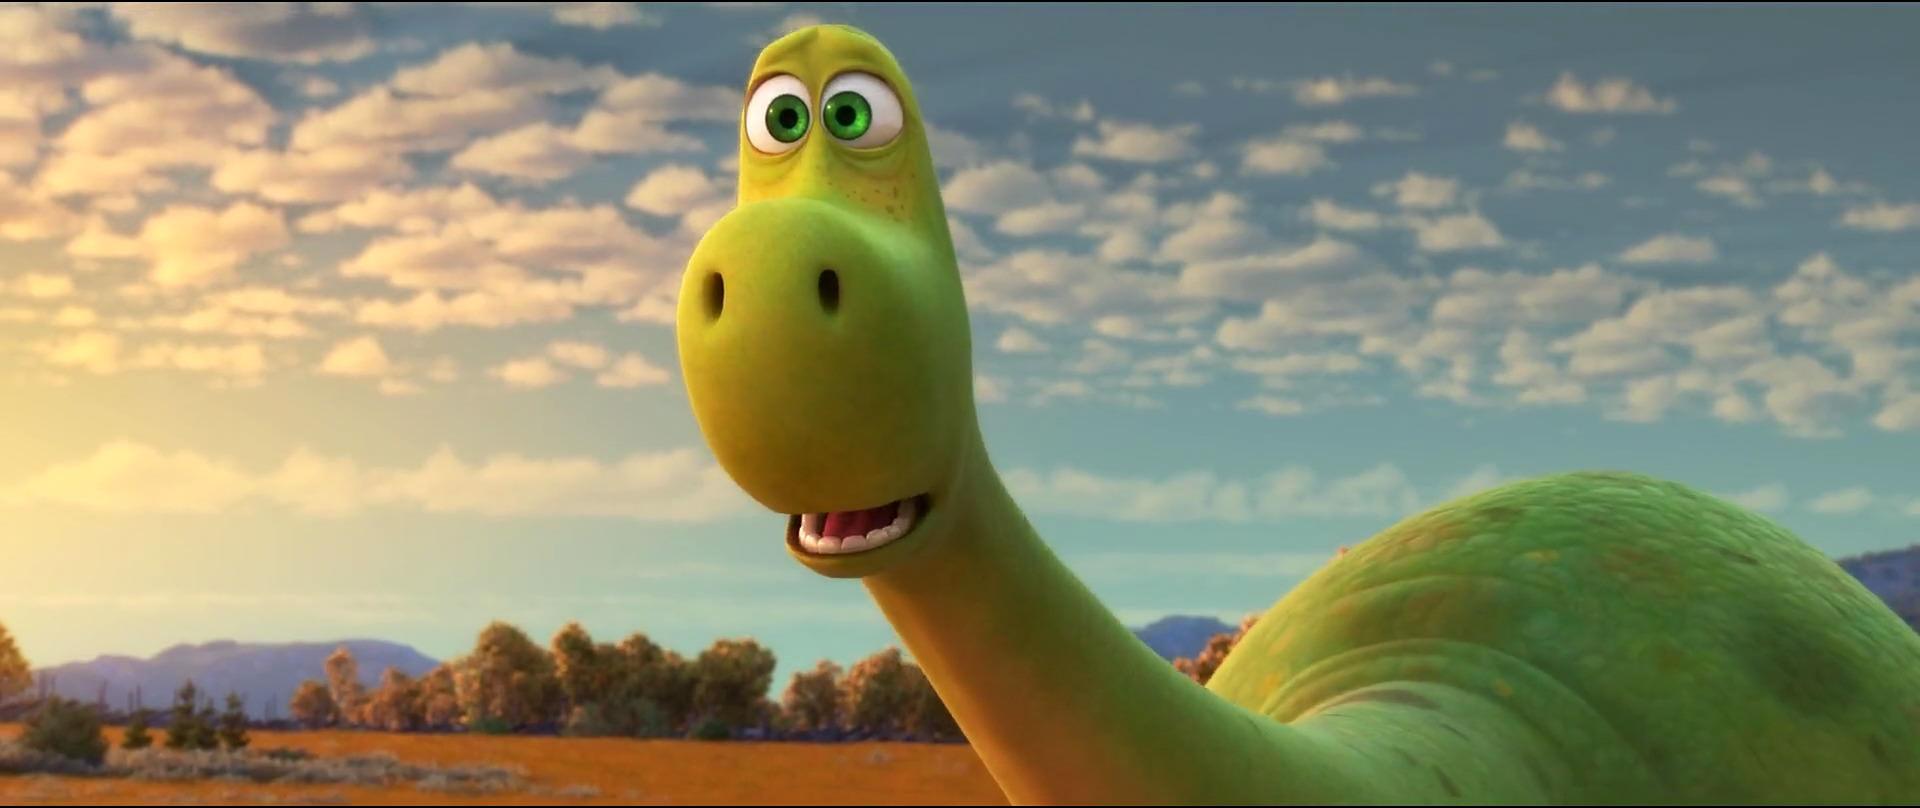 ida personnage character pixar disney voyage arlo good dinosaur